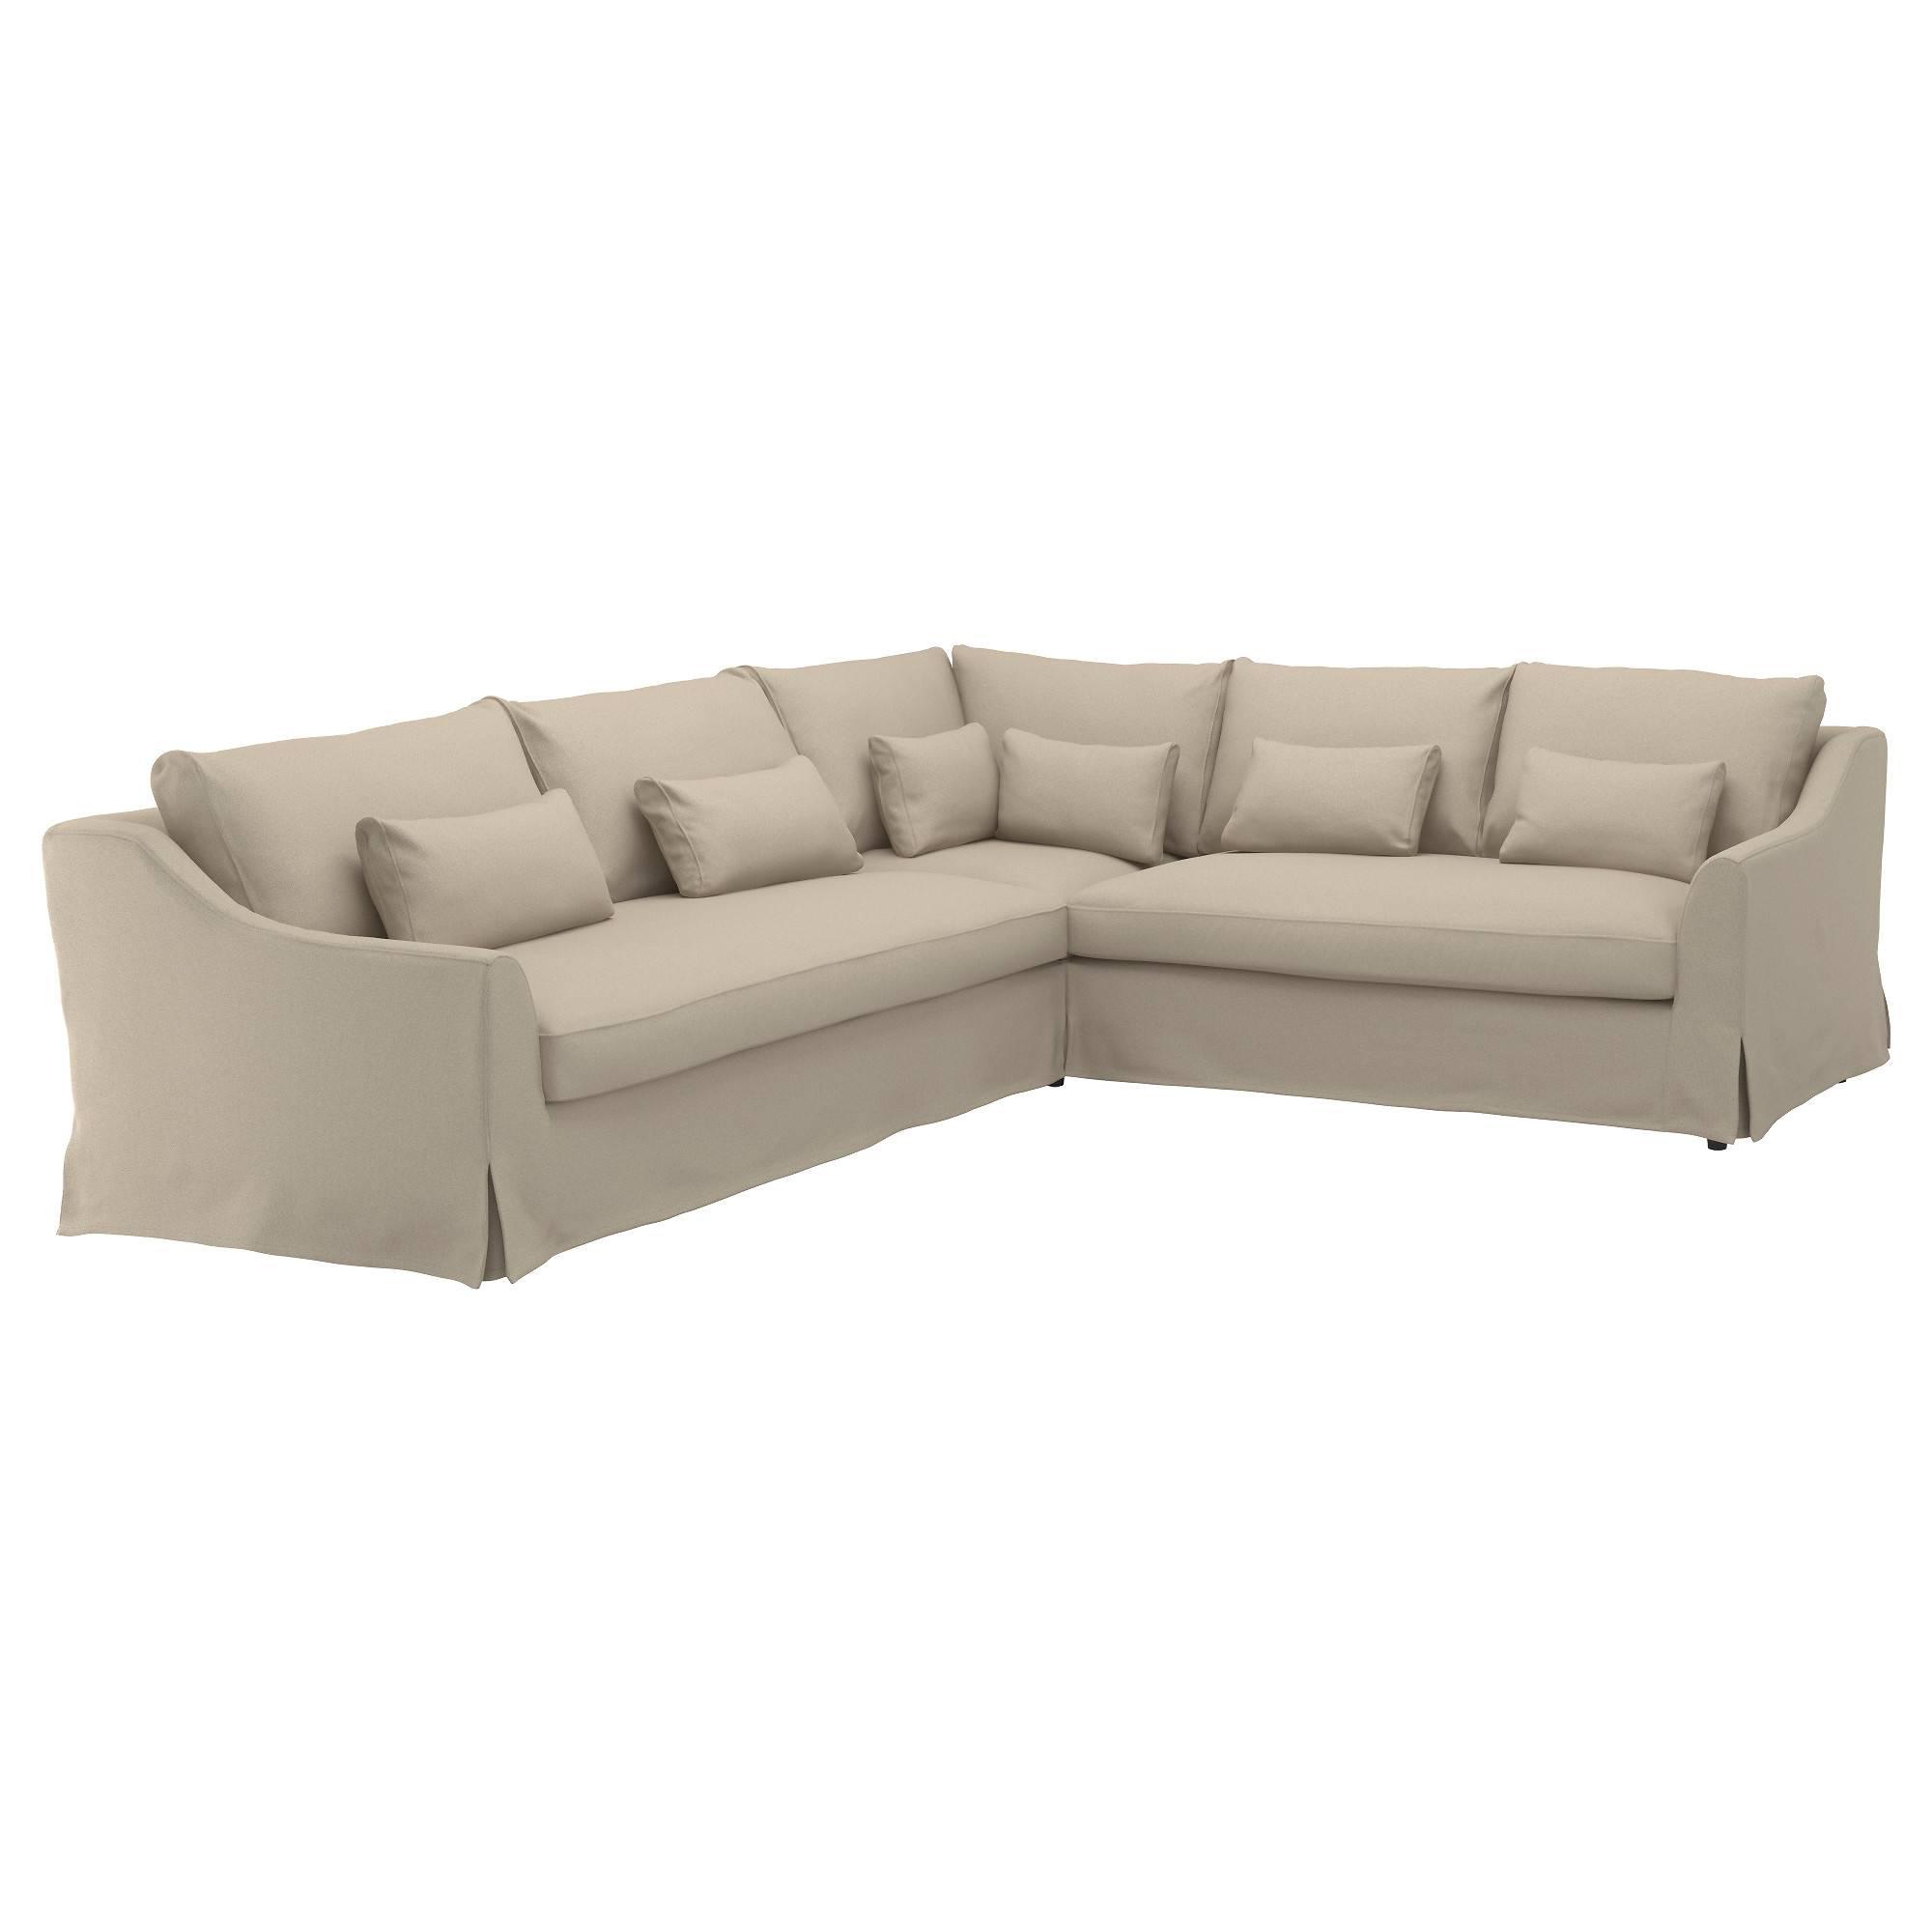 Fabric Sectional Sofas - Ikea regarding Sectinal Sofas (Image 6 of 30)